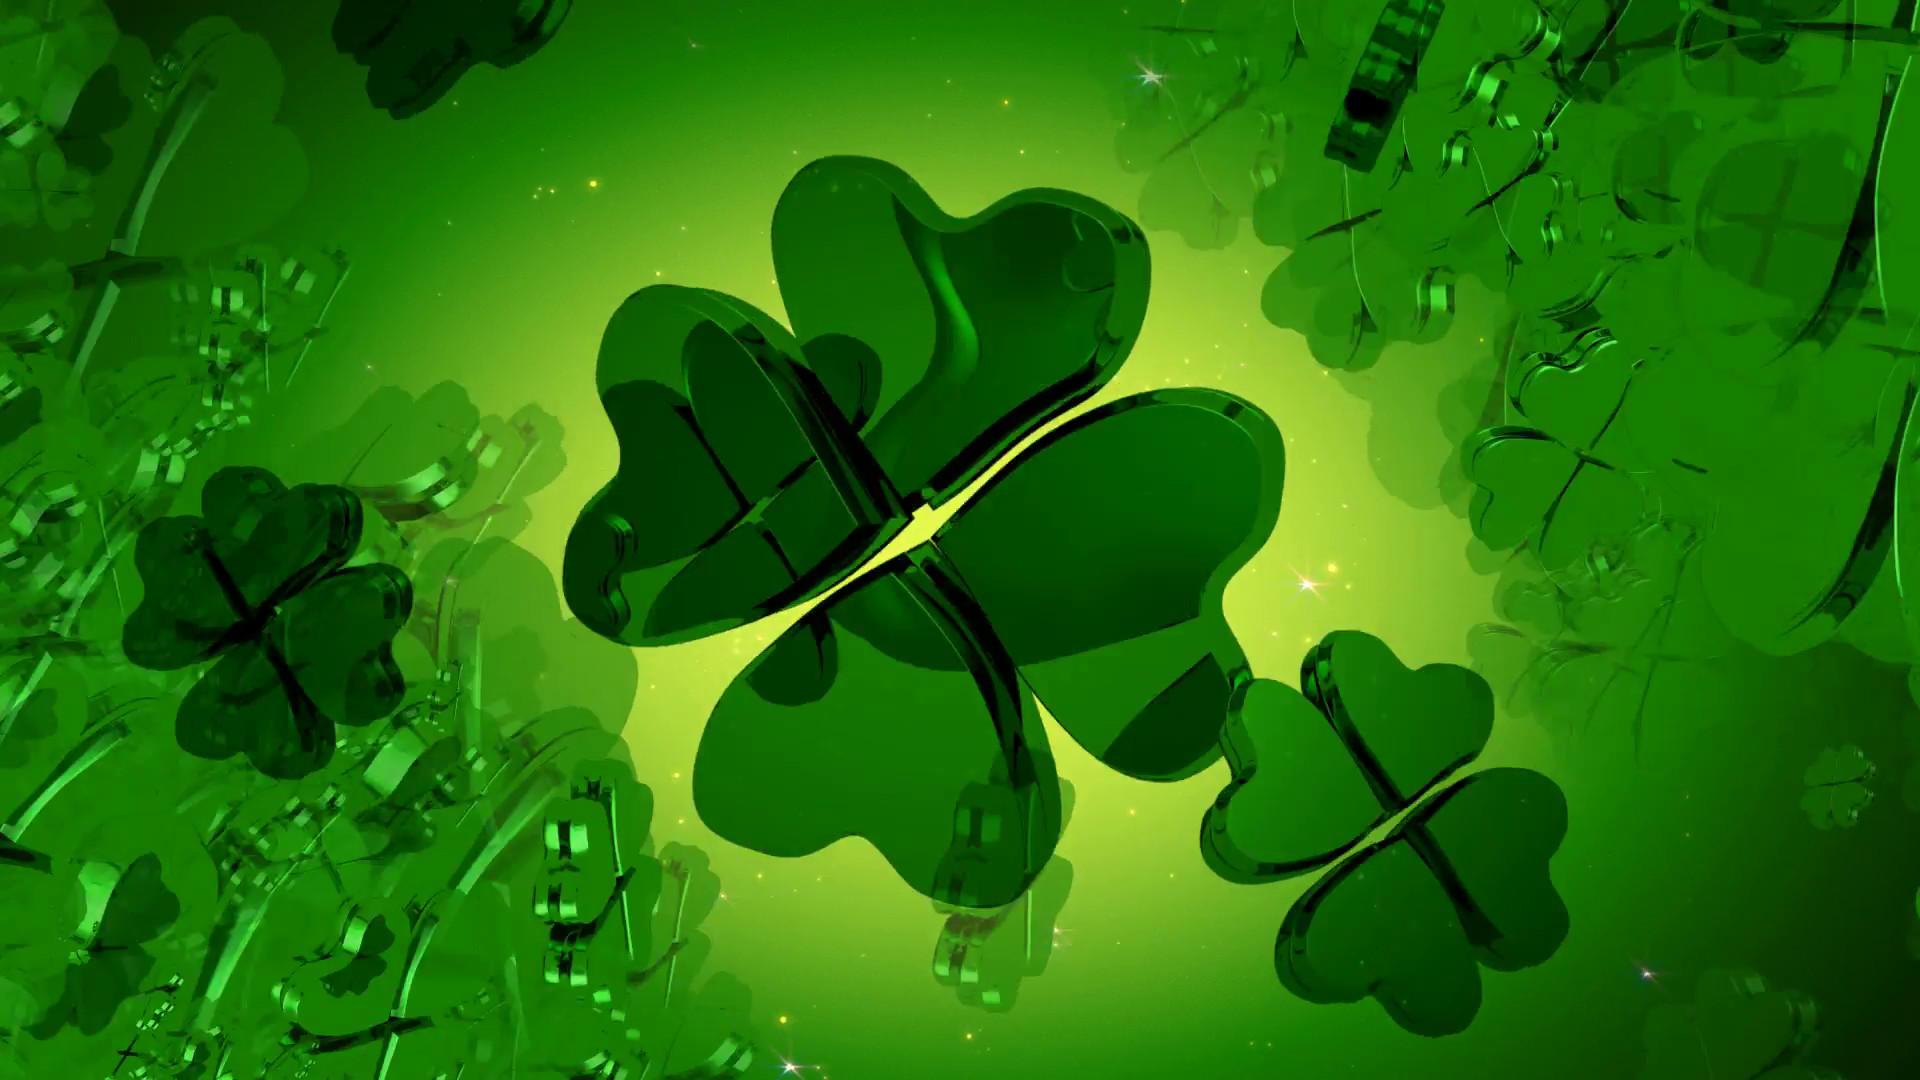 St Patricks Day Wallpaper Iphone 6 4 Leaf Clover Wallpaper 46 Images